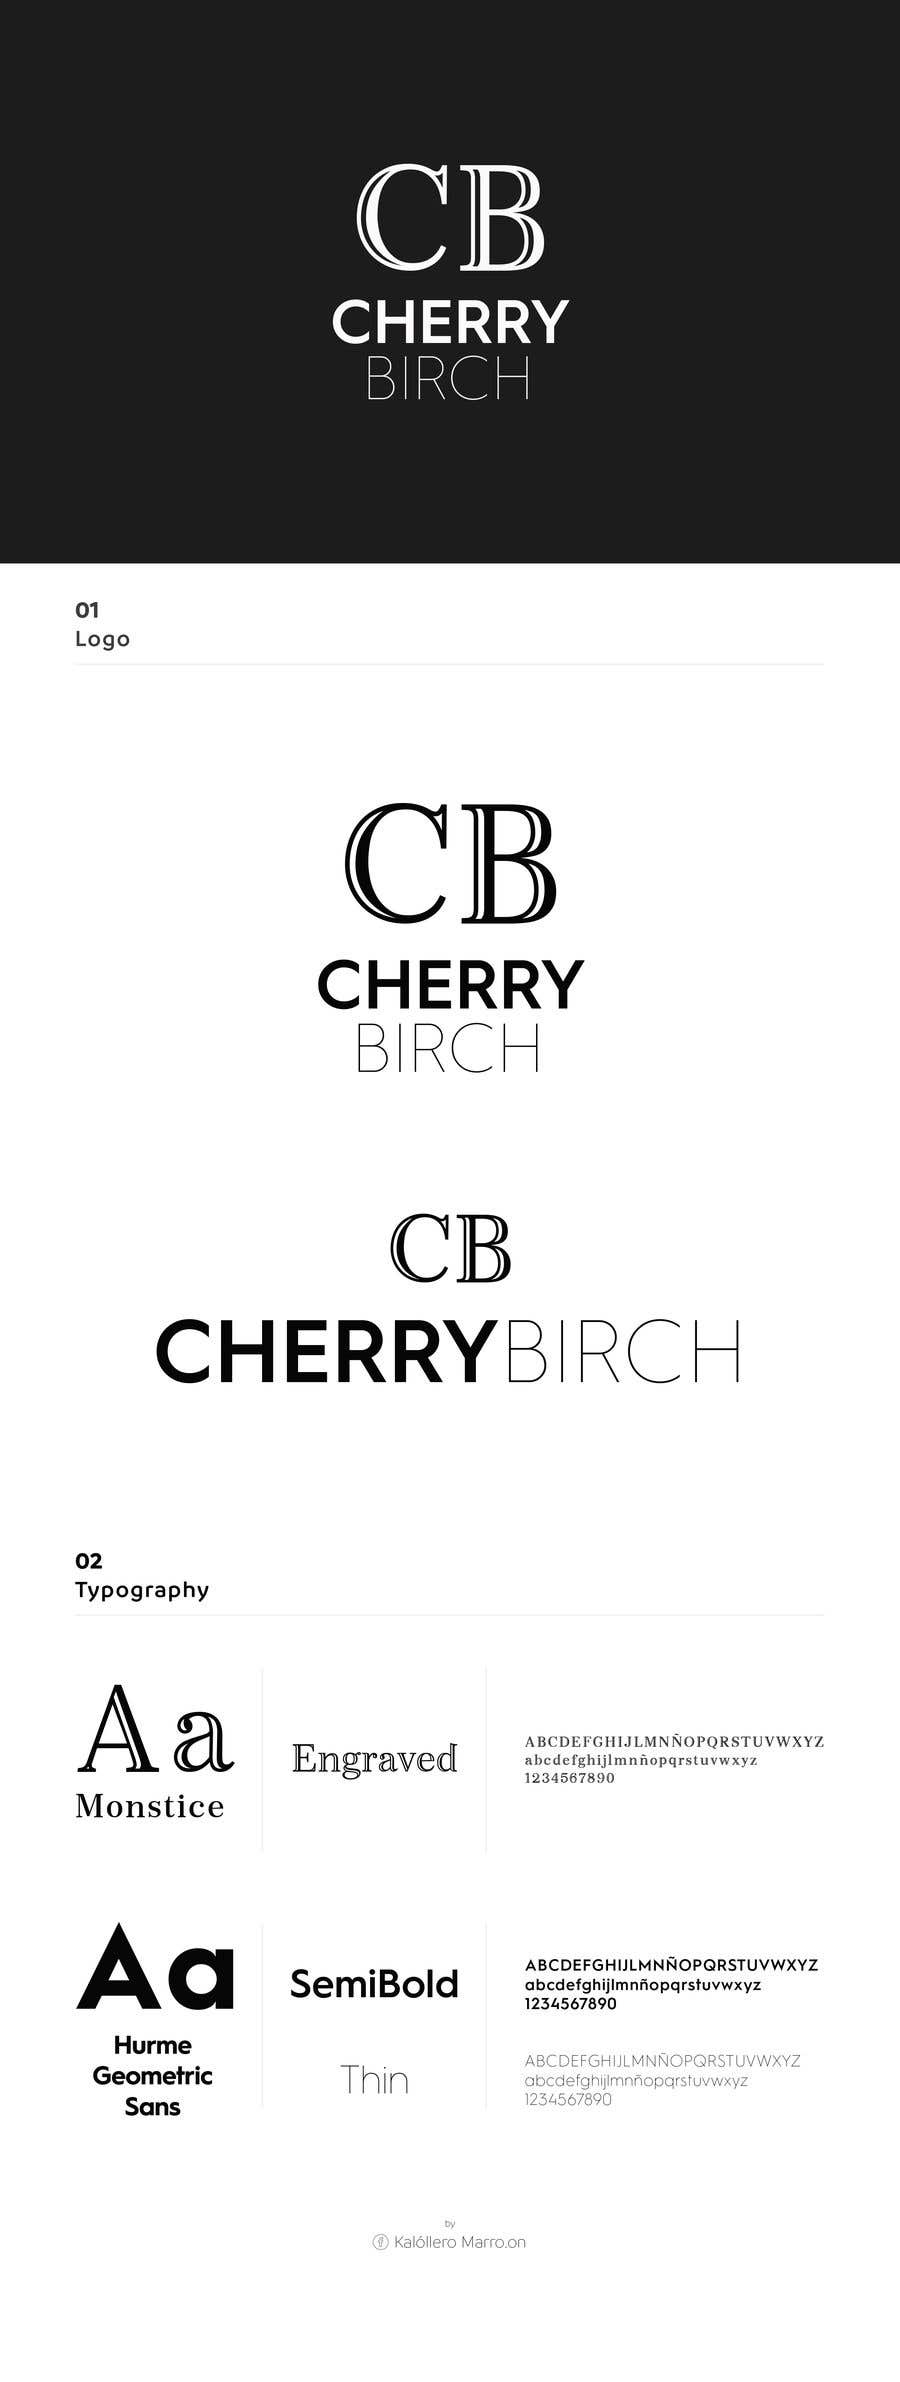 Penyertaan Peraduan #69 untuk Brand Expert Needed - UI\Theme + logo for Cherry Birch